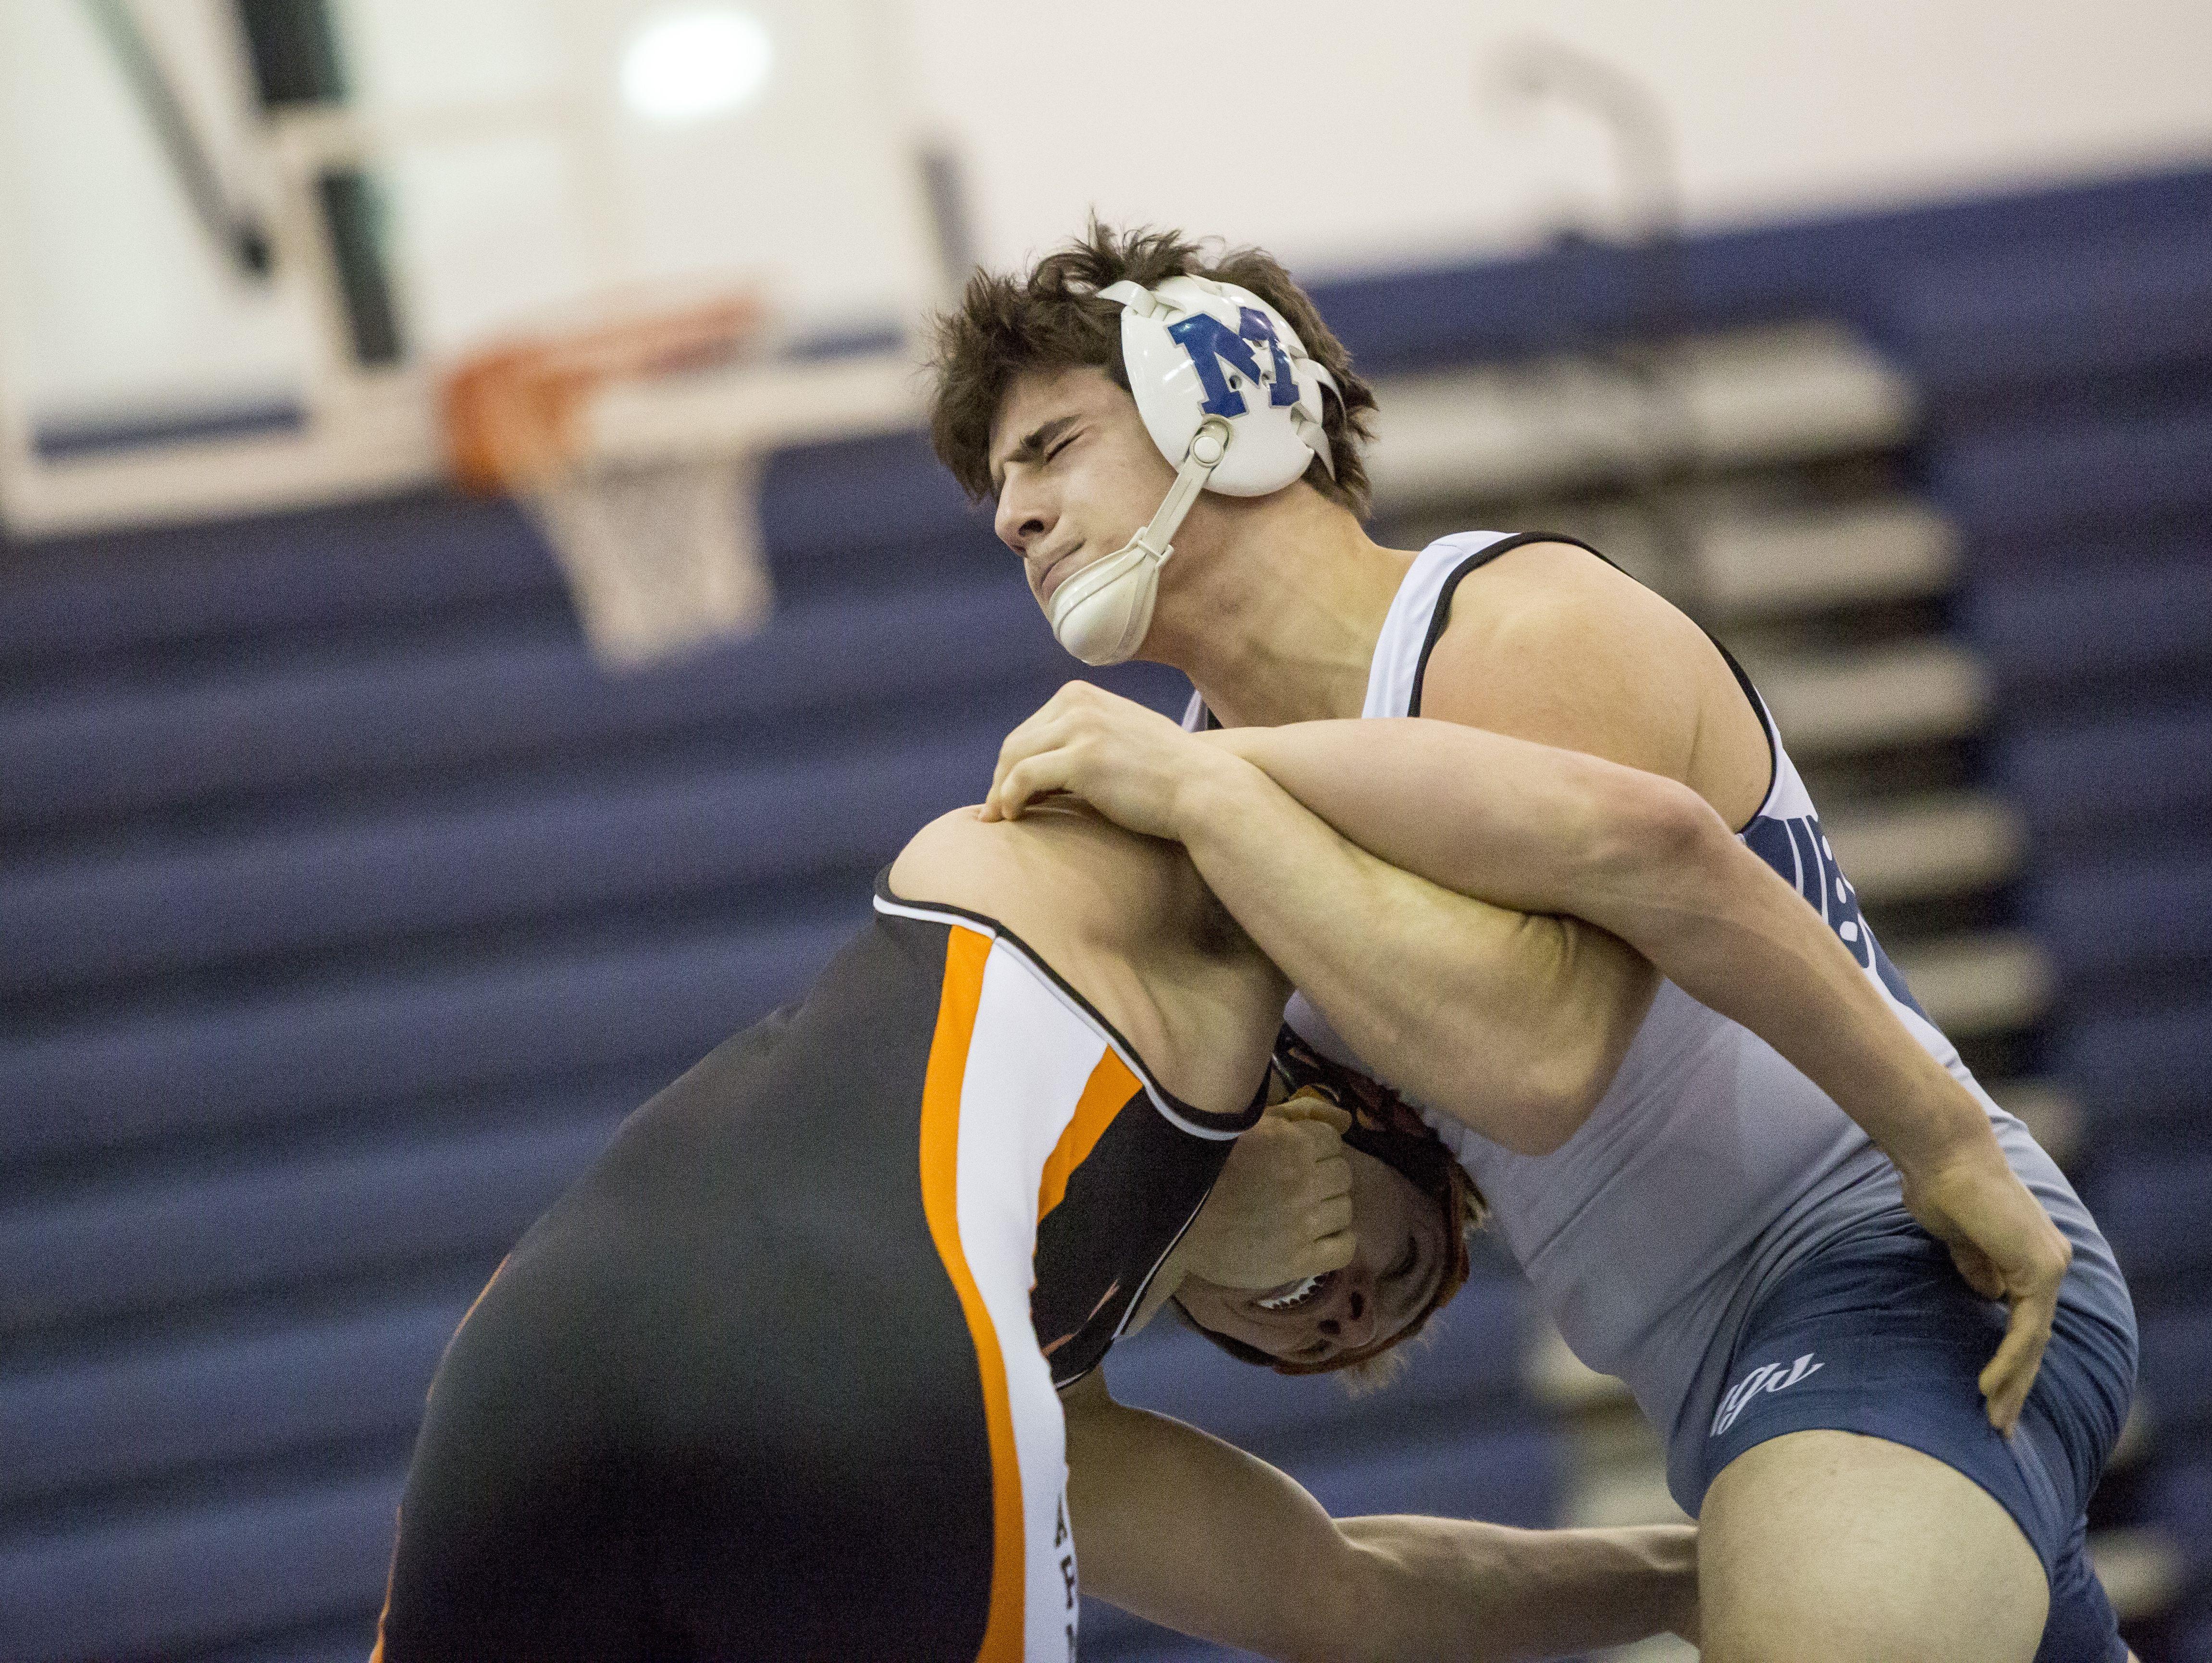 Marysville's Dante Chrcek wrestles Armada's Trent Grabowski during a wrestling meet Wednesday, Feb. 10, 2016 at Marysville High School.